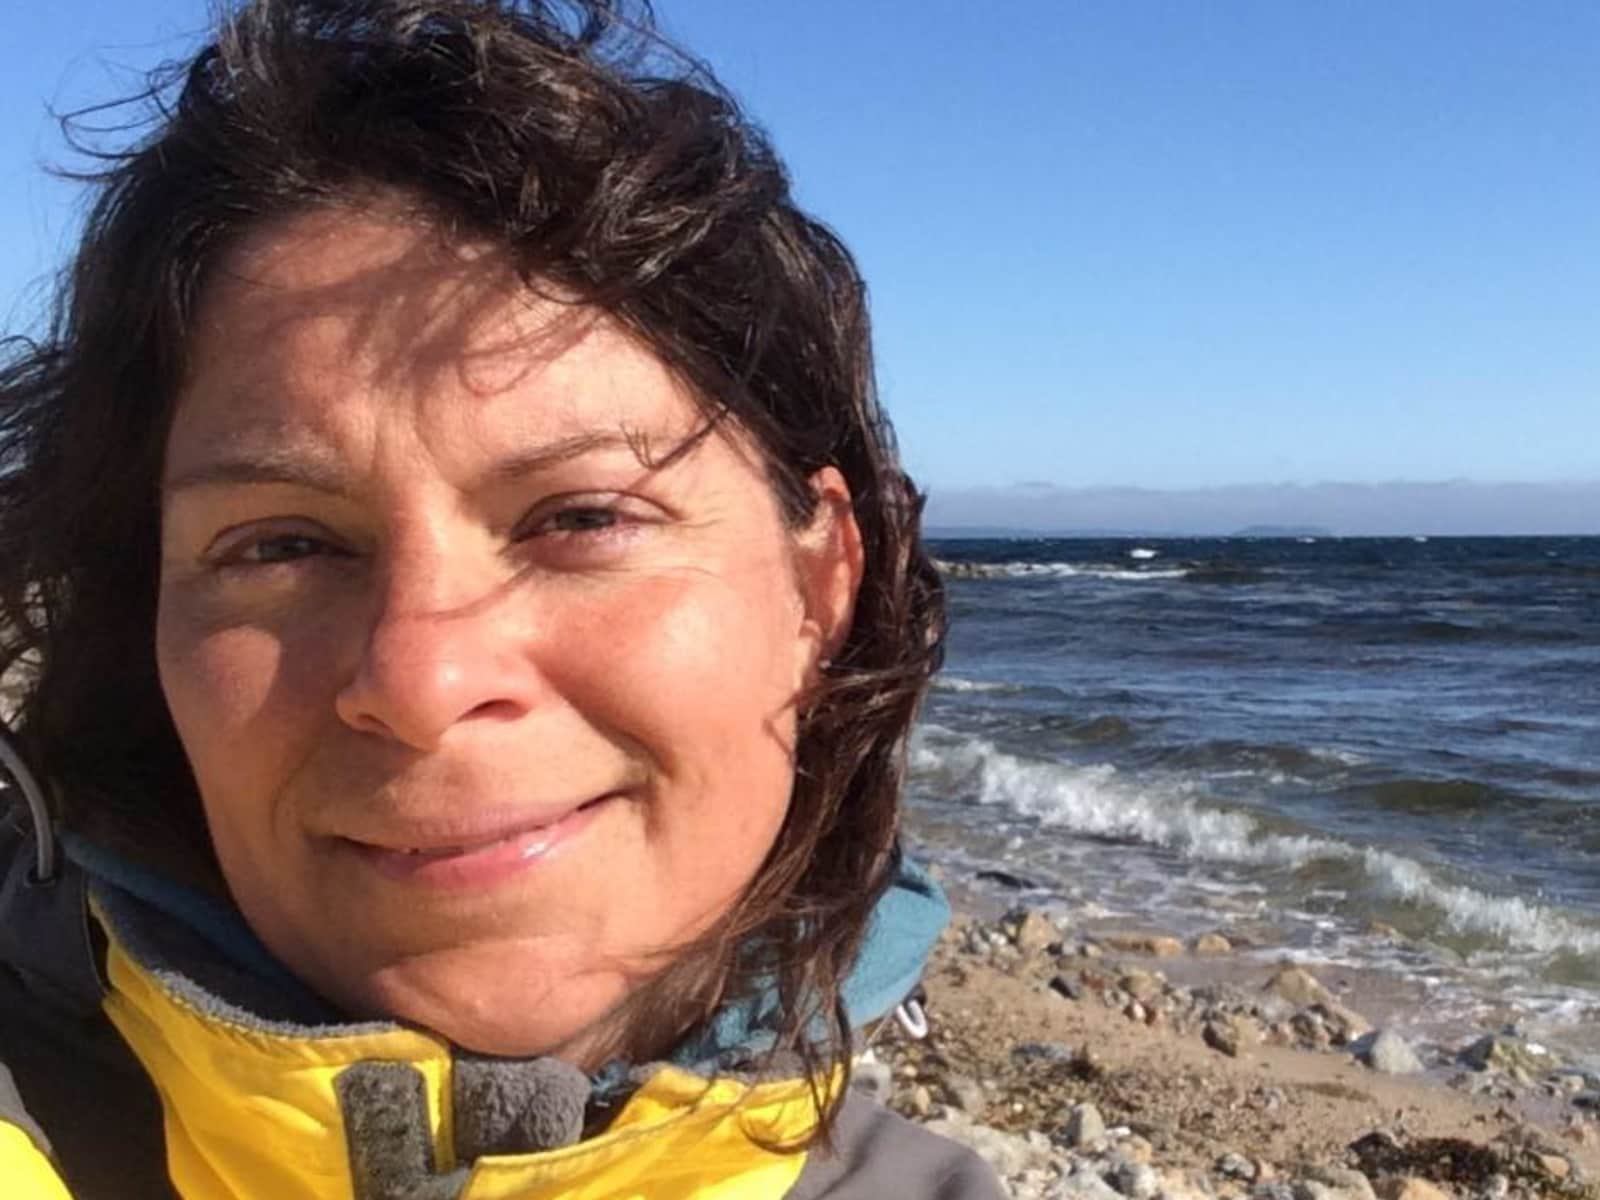 Sherri from Tantallon, Nova Scotia, Canada